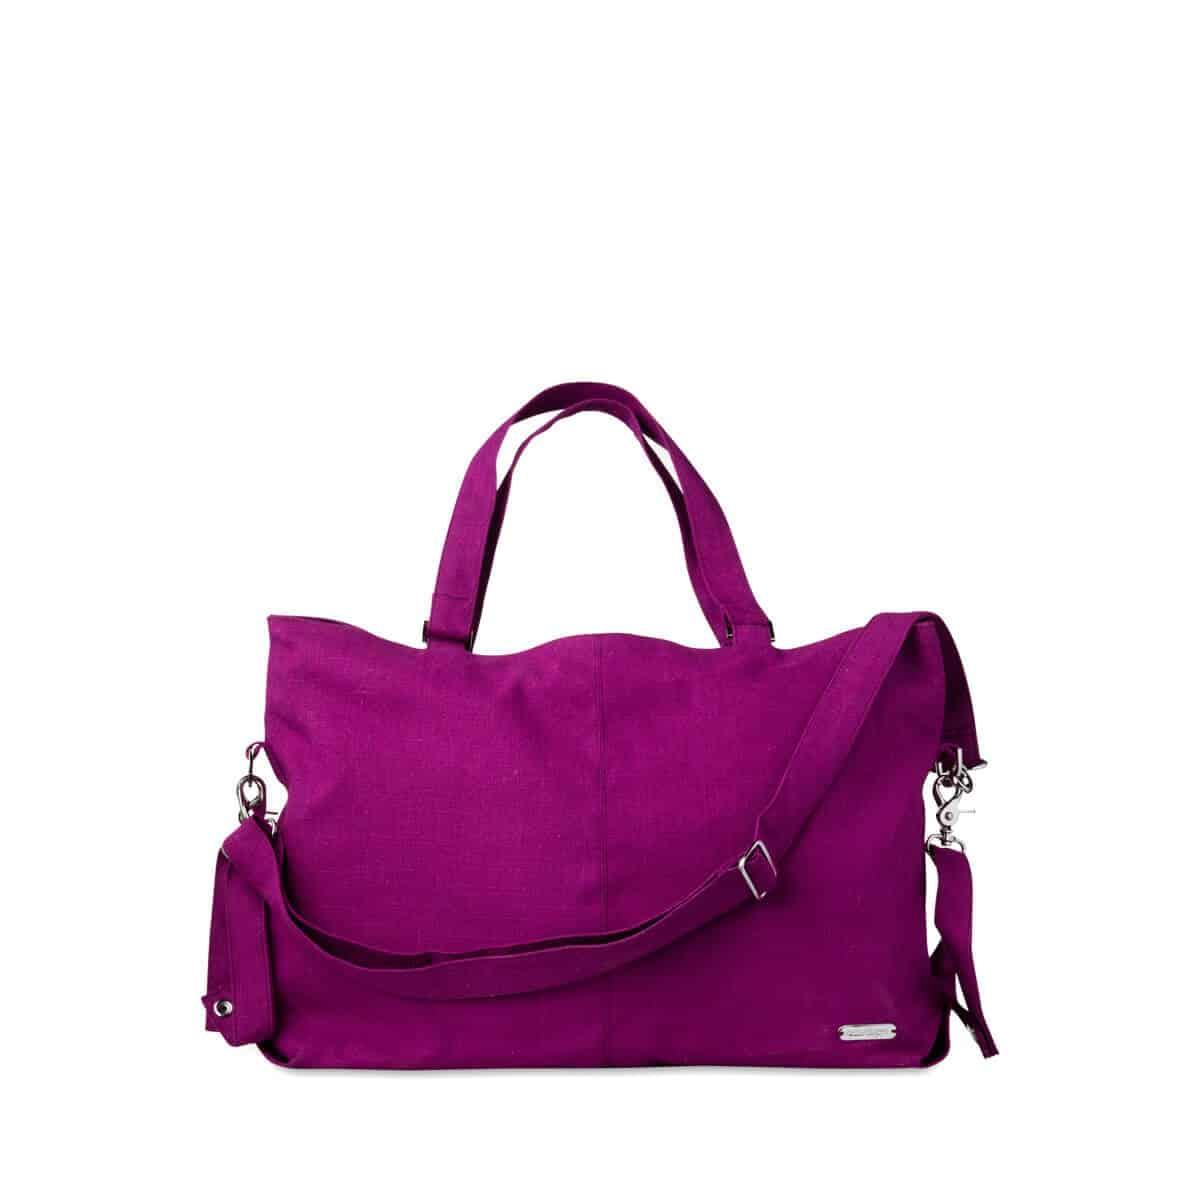 Linen Mom Carryall Bag, Orchid